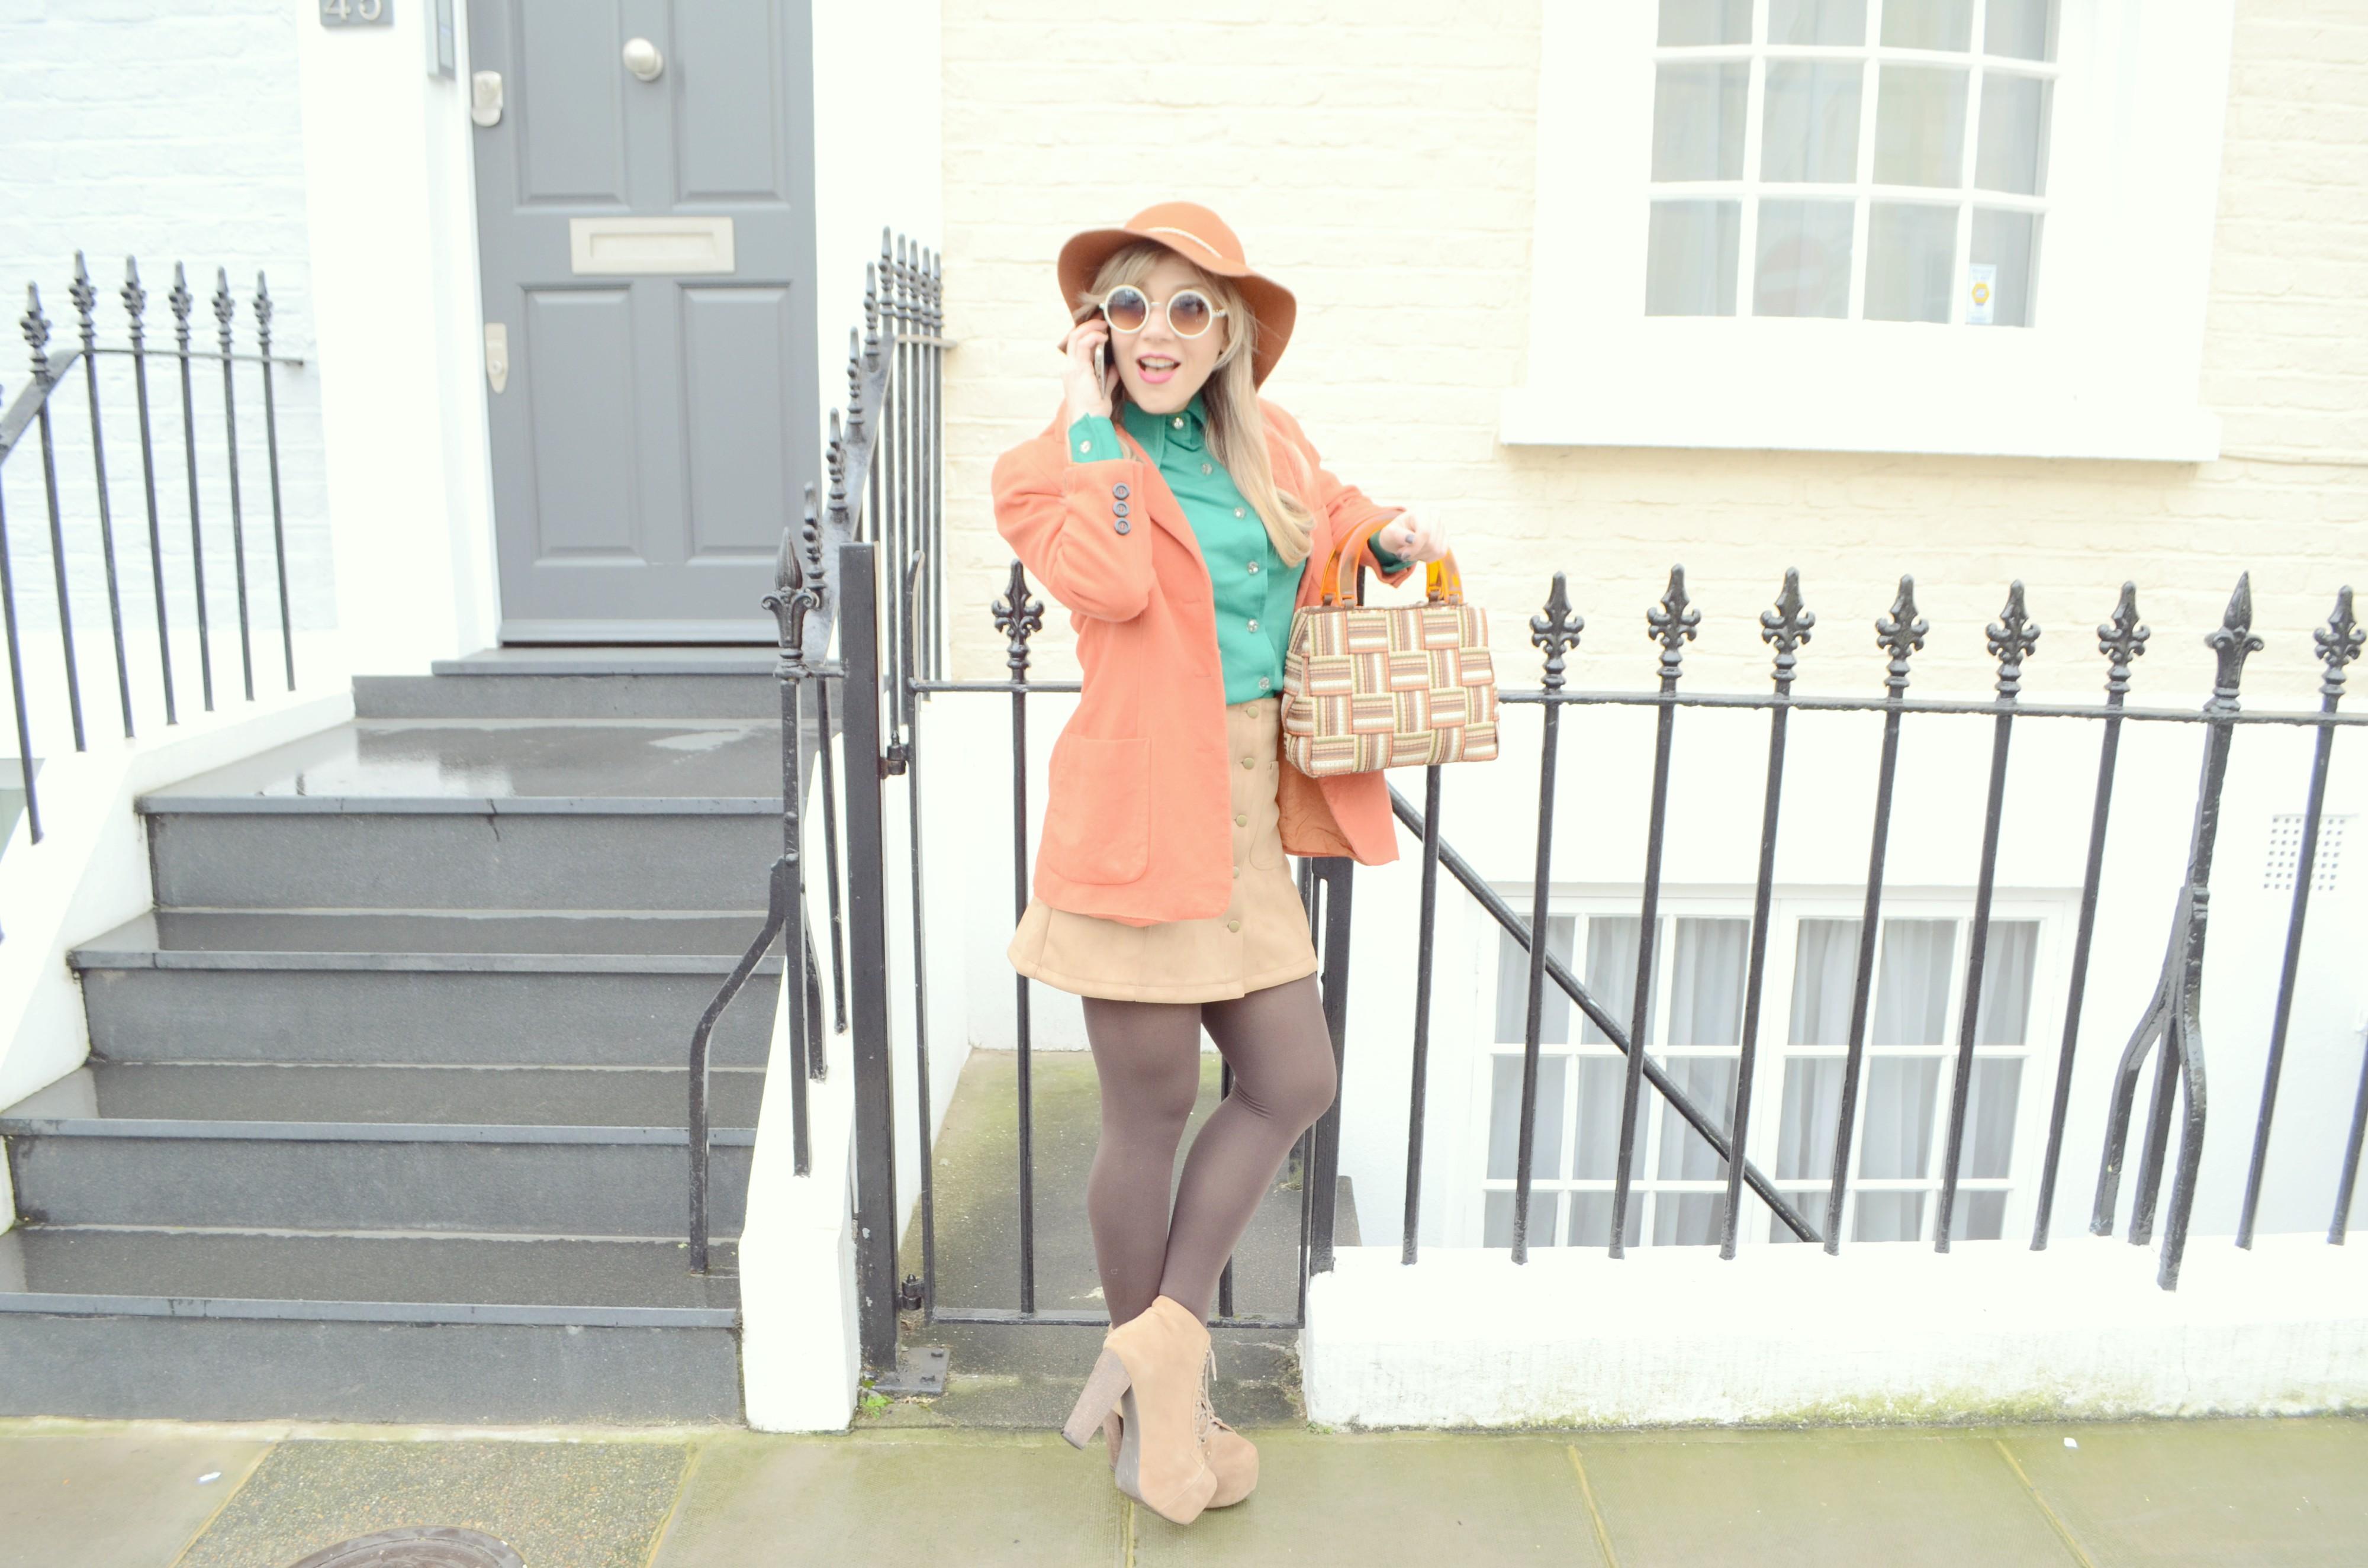 Blog-de-moda-ante-skirt-look-JustFab-outfit-green-spring-top-Jeffrey-Campbell-shoes-PiensaenChic-Piensa-en-Chic